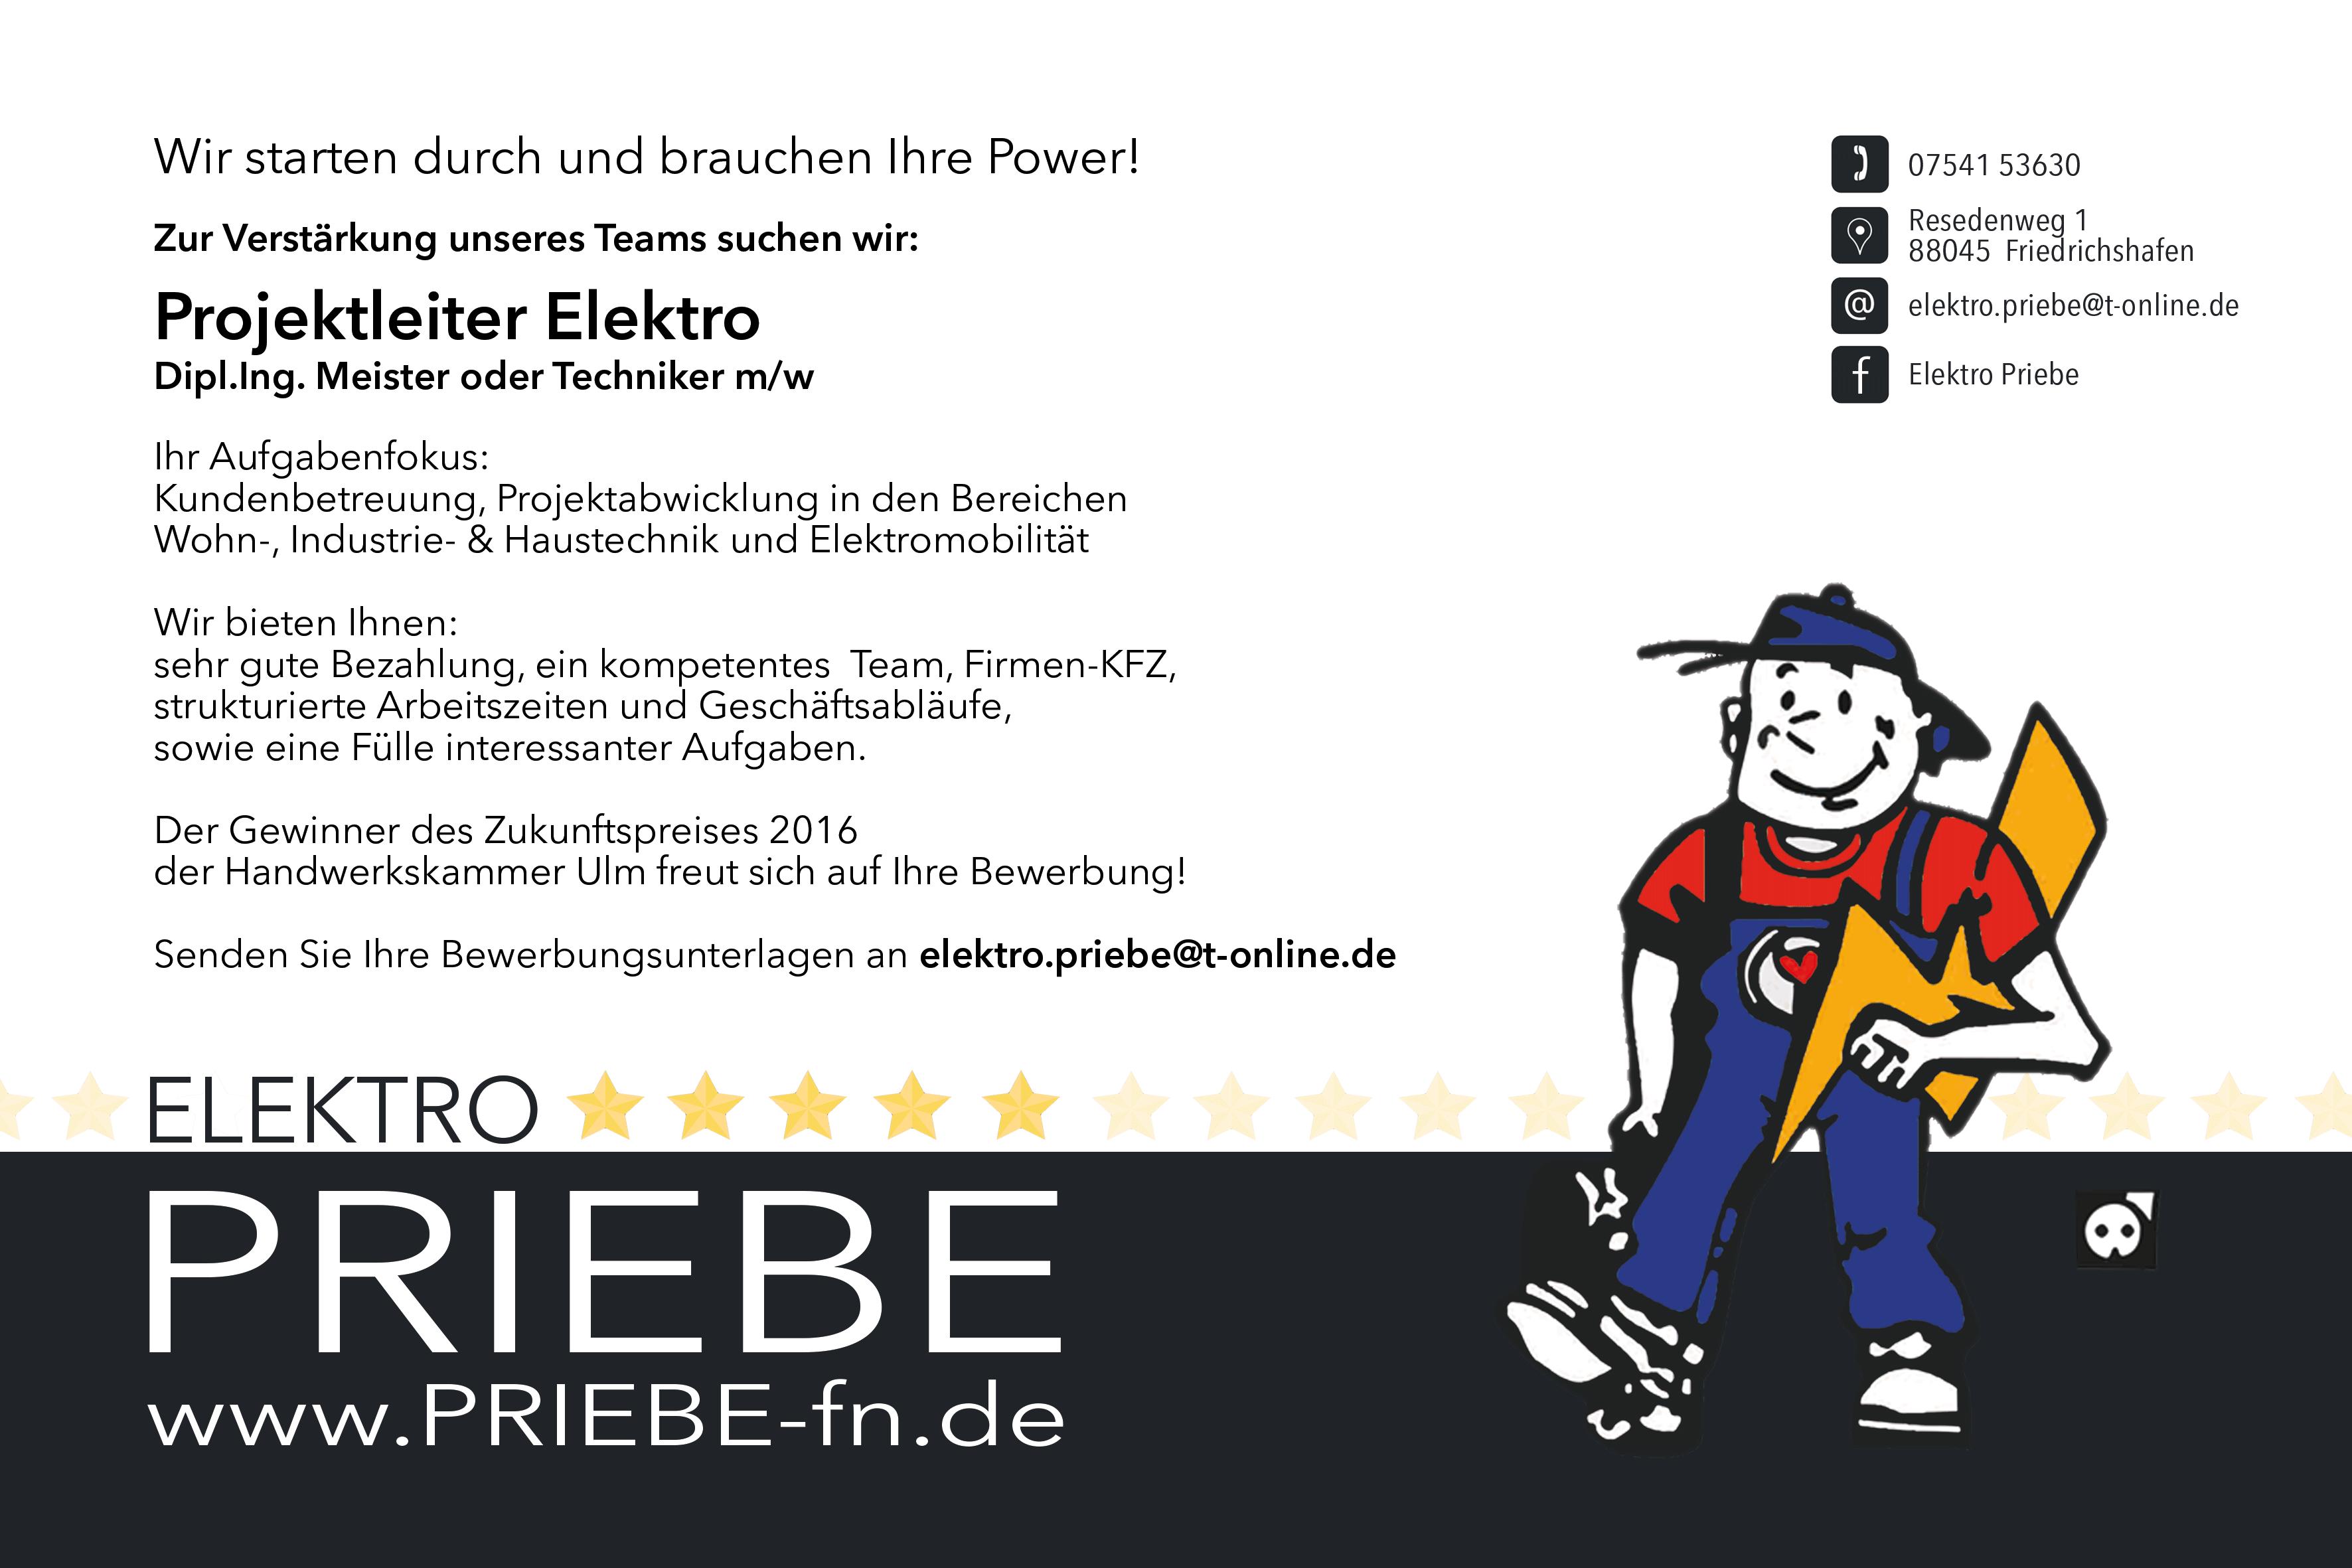 Berühmt Post Rahmenbau Mit Wohn Ideen - Rahmen Ideen ...